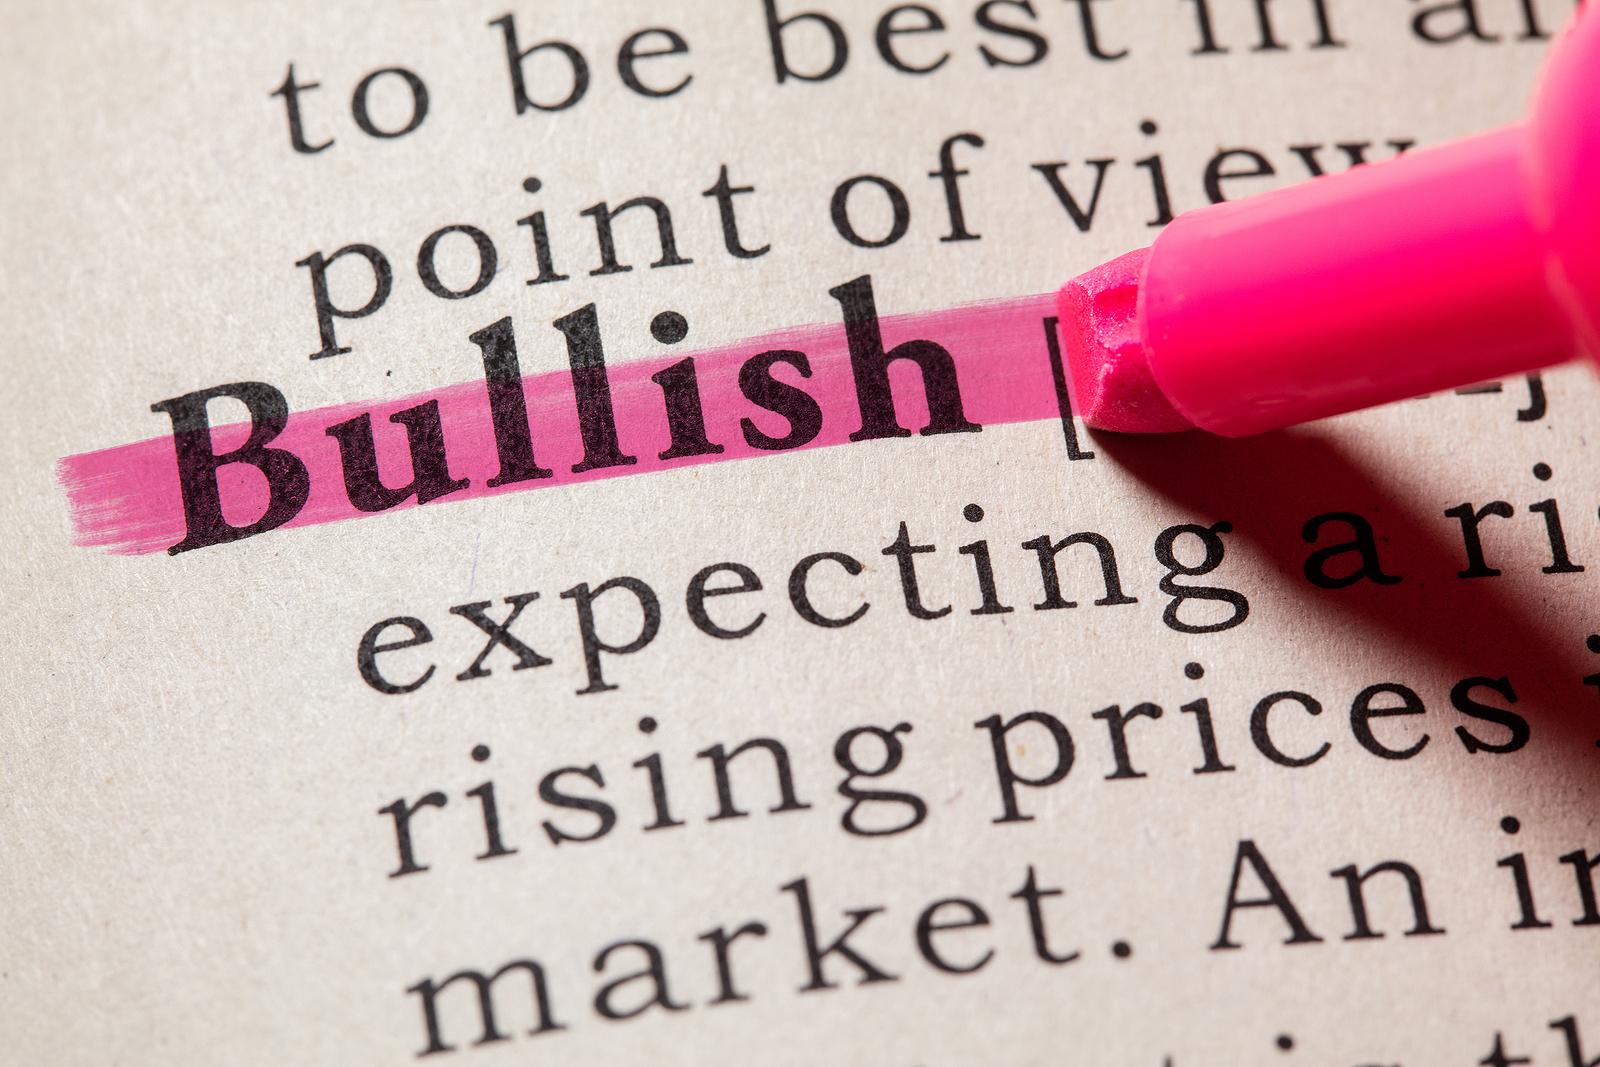 Bullish trader, betting on upside, bullish stock outlook, record highs